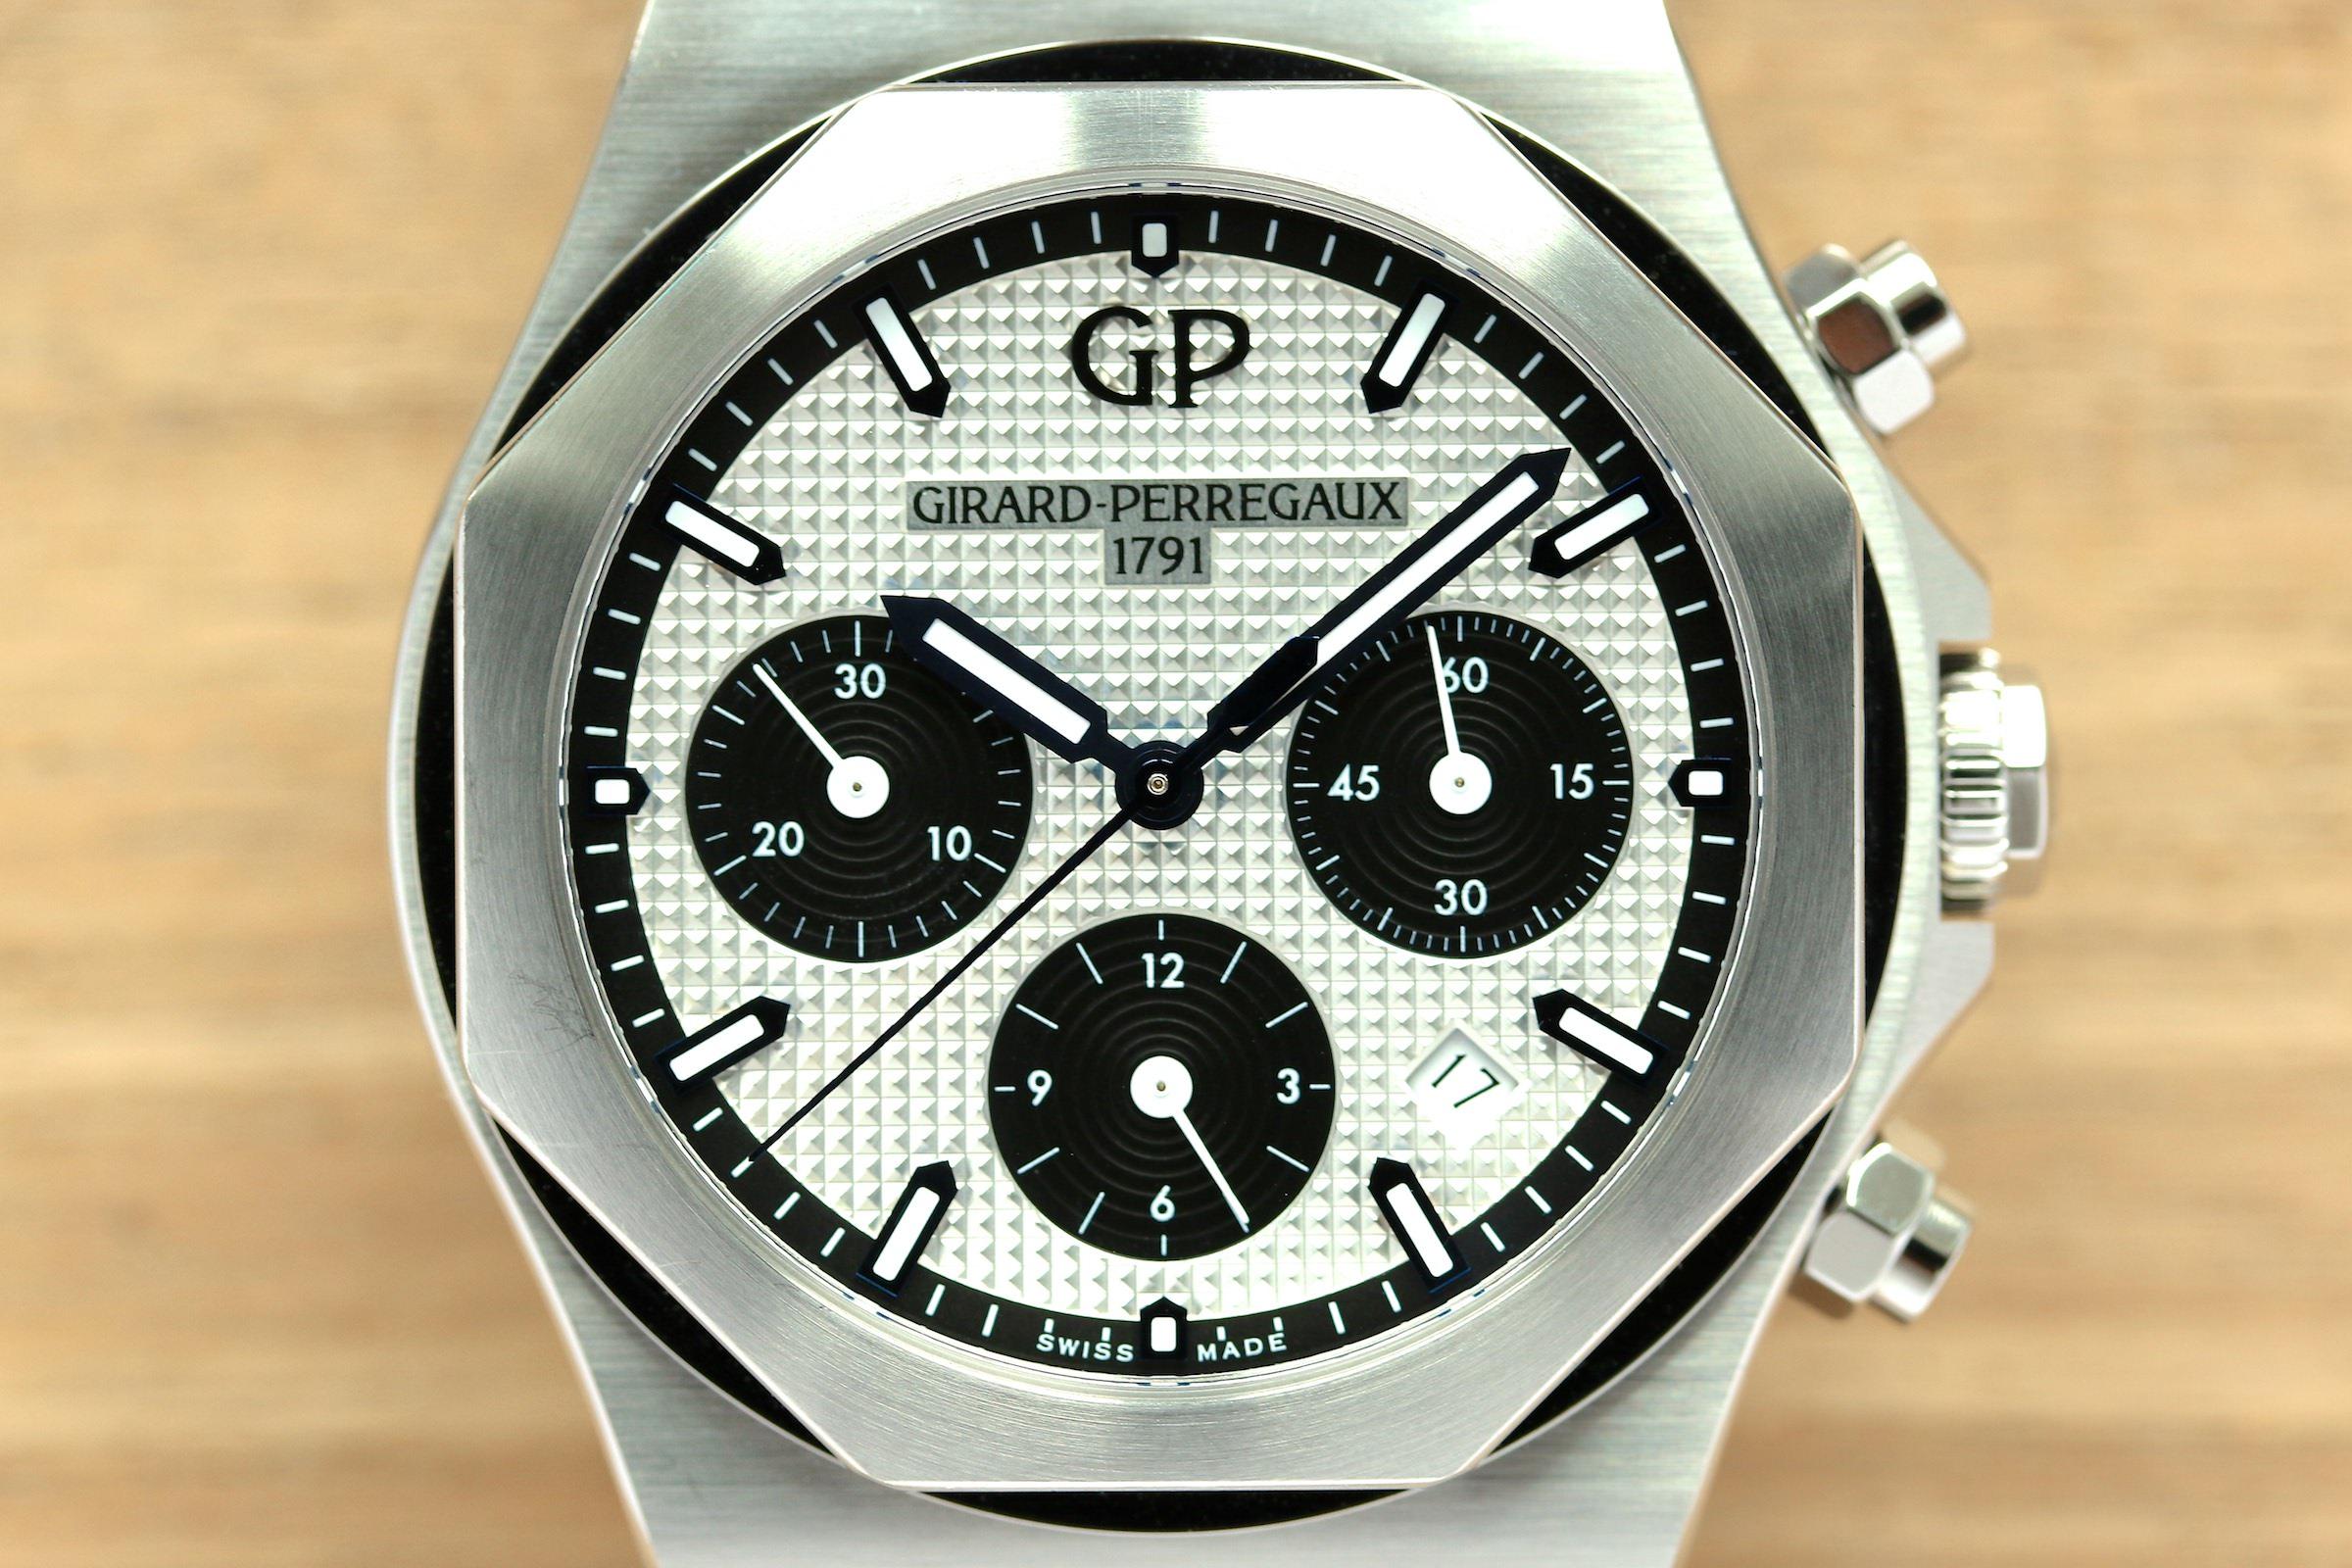 Der Girard-Perregaux Laureato Chronograph